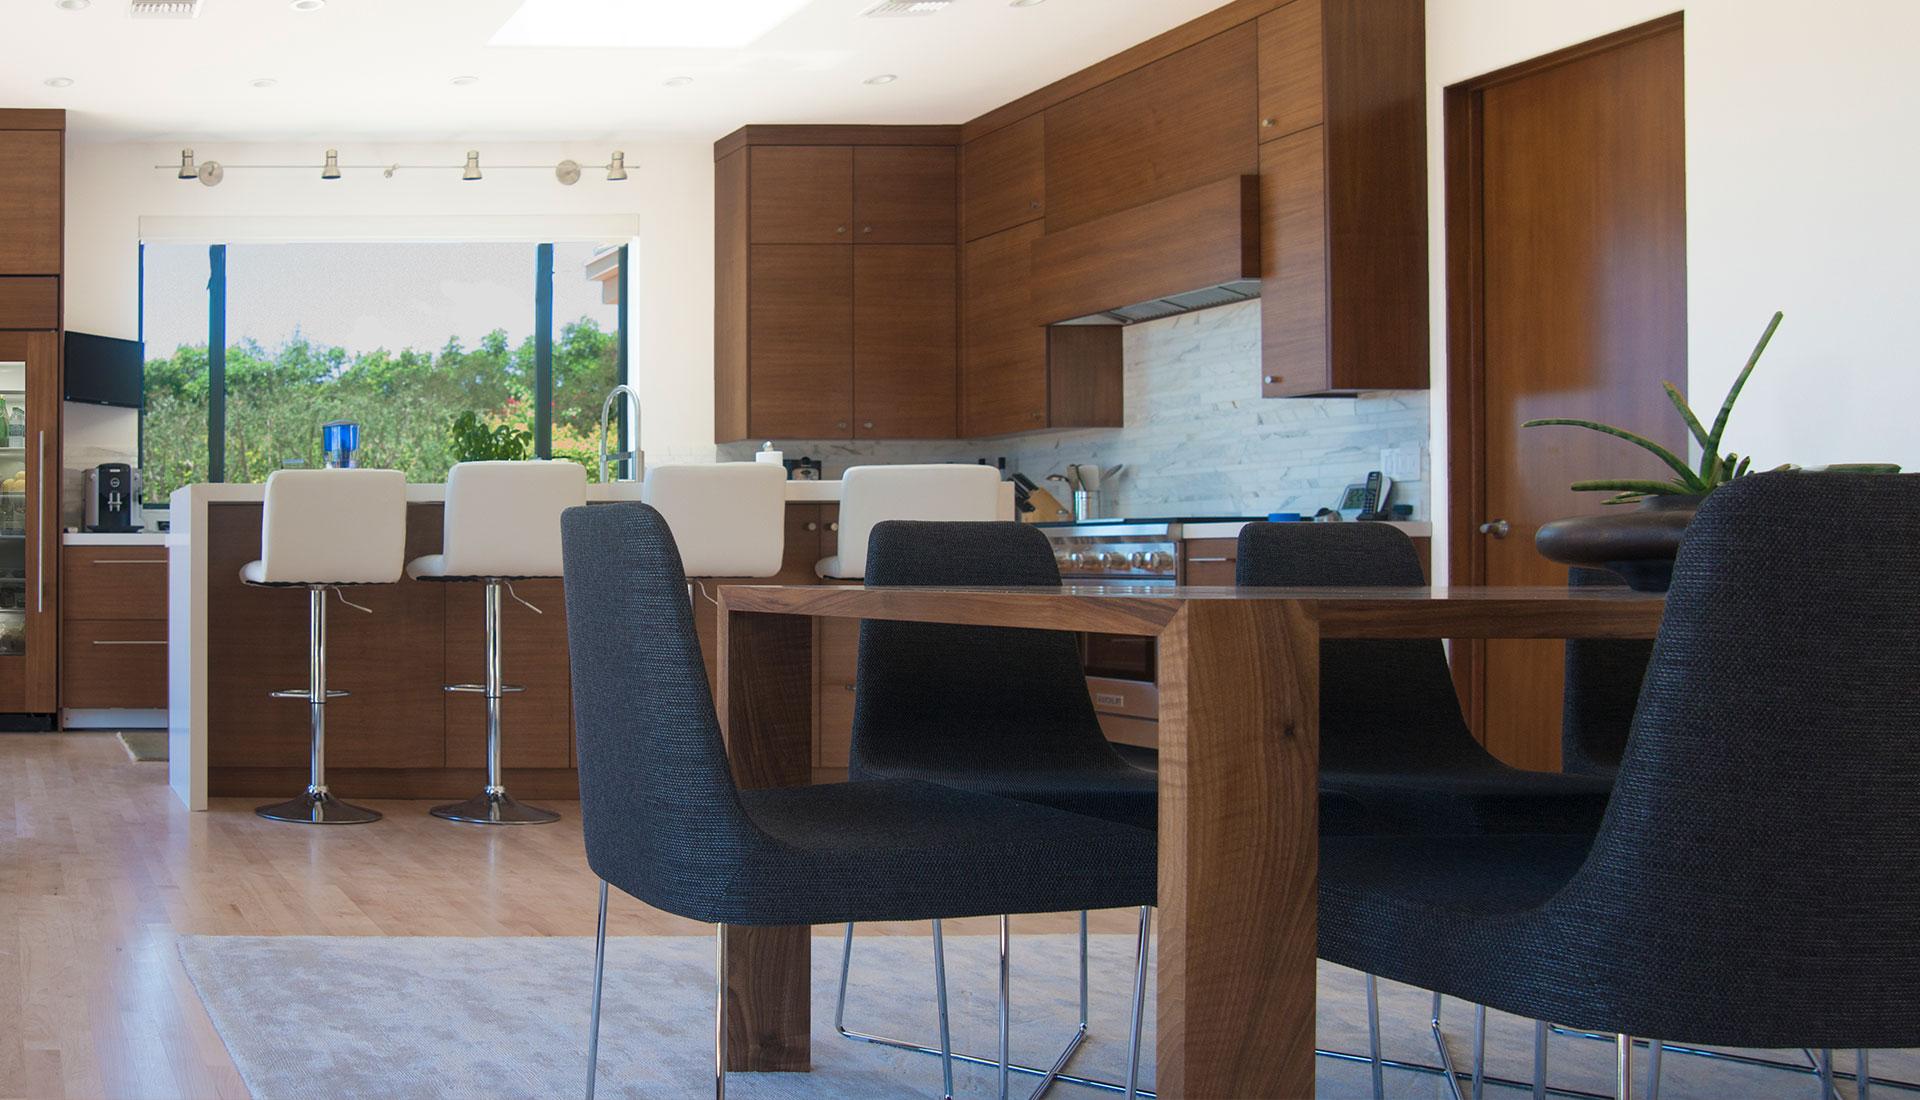 Fitucci Custom Cabinets Los Angeles